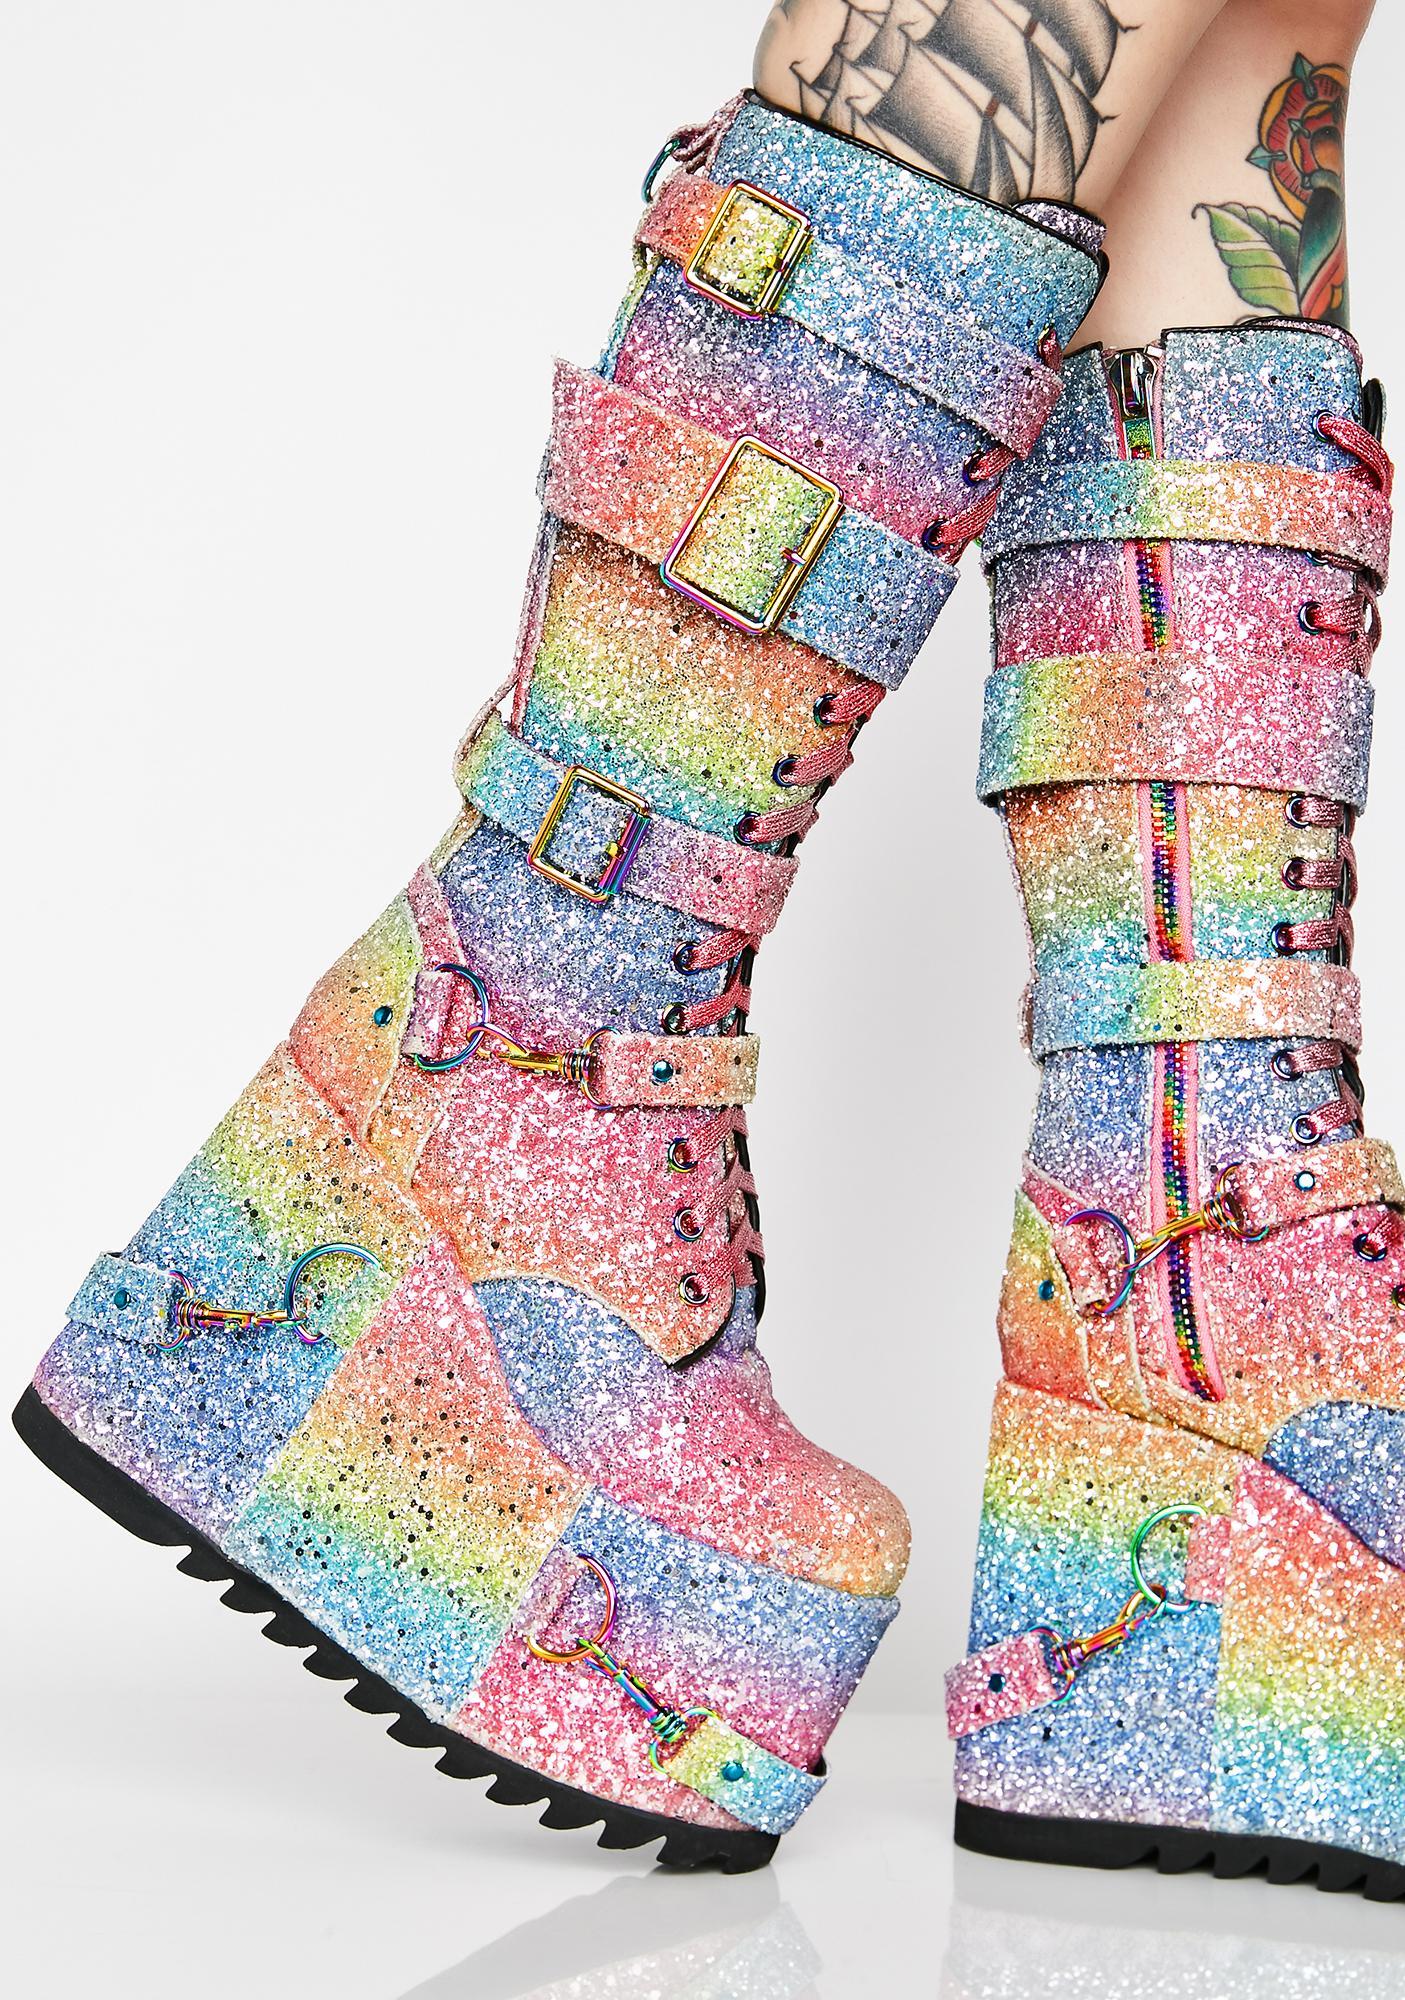 Rainbow Glitter Platform Lace Up Boots